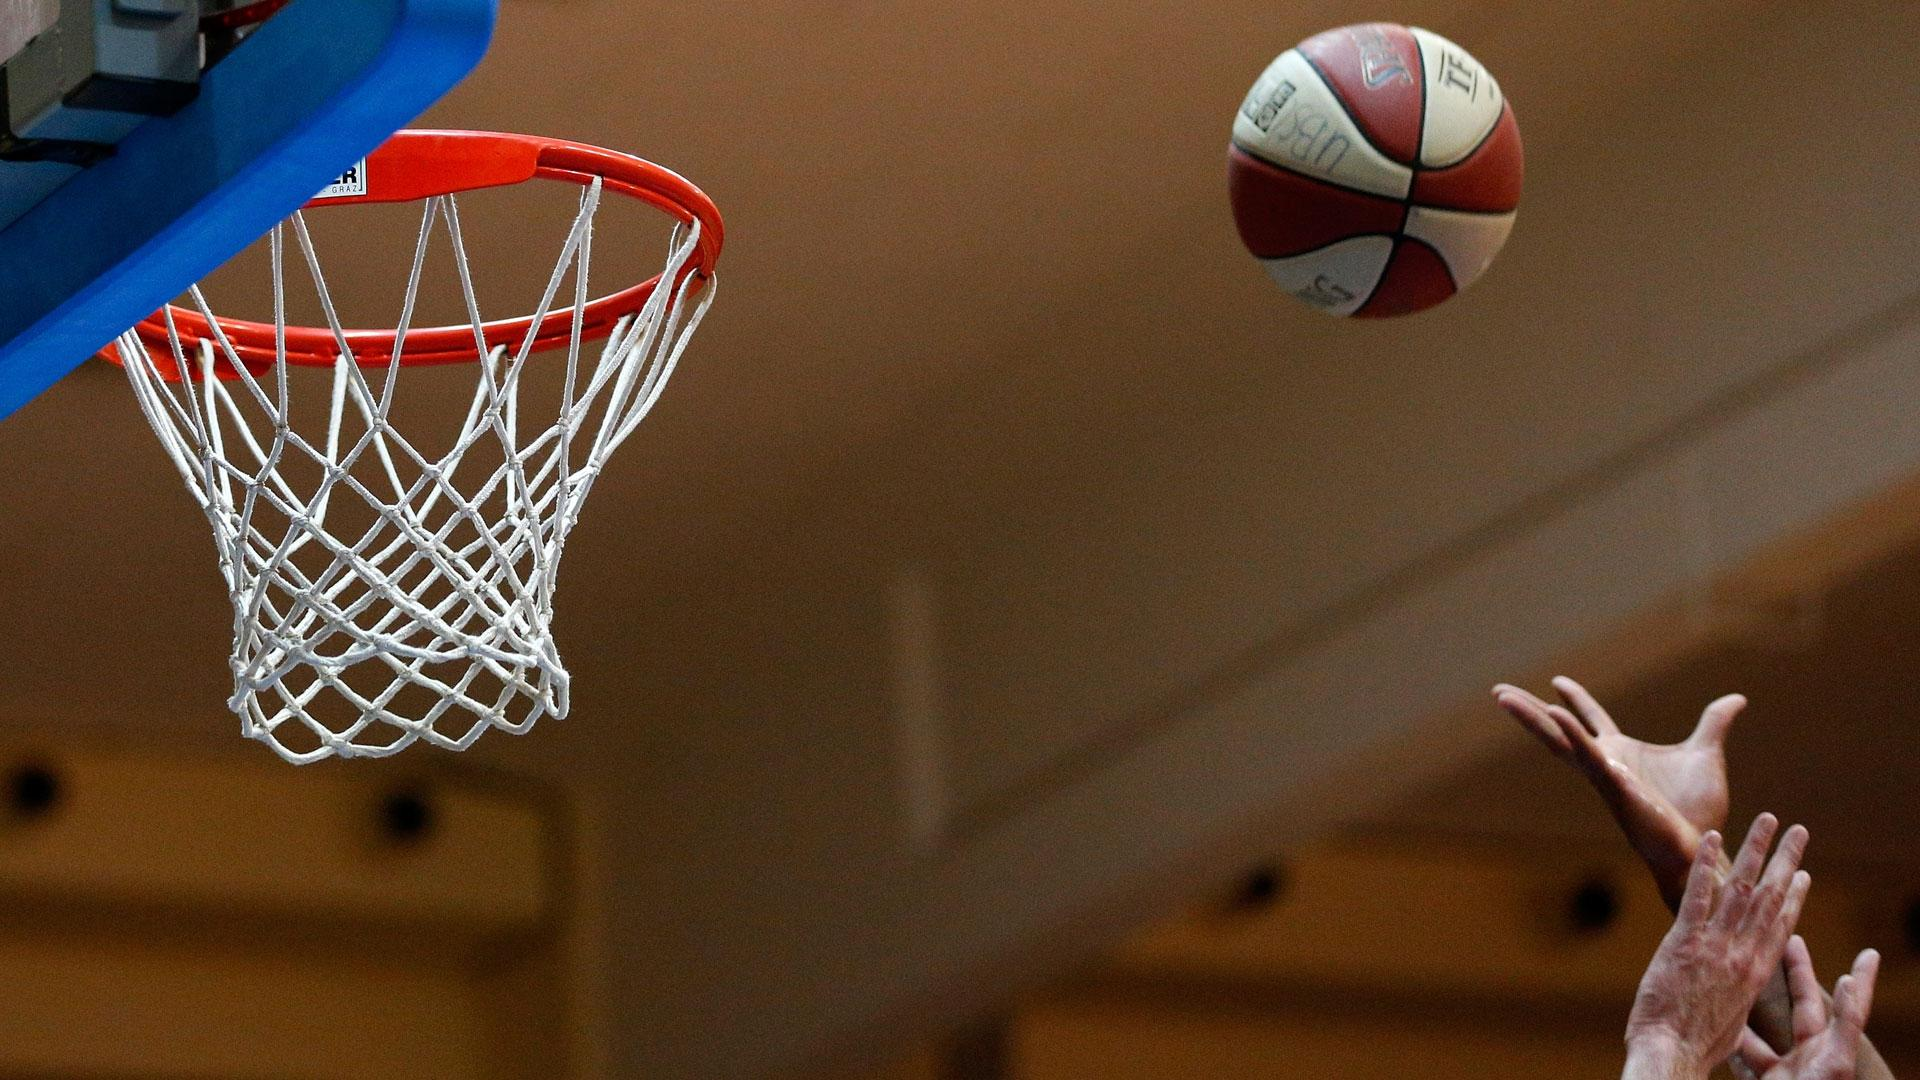 Tbl Basketball In Yakima - Greek Basketball Live Streaming , HD Wallpaper & Backgrounds